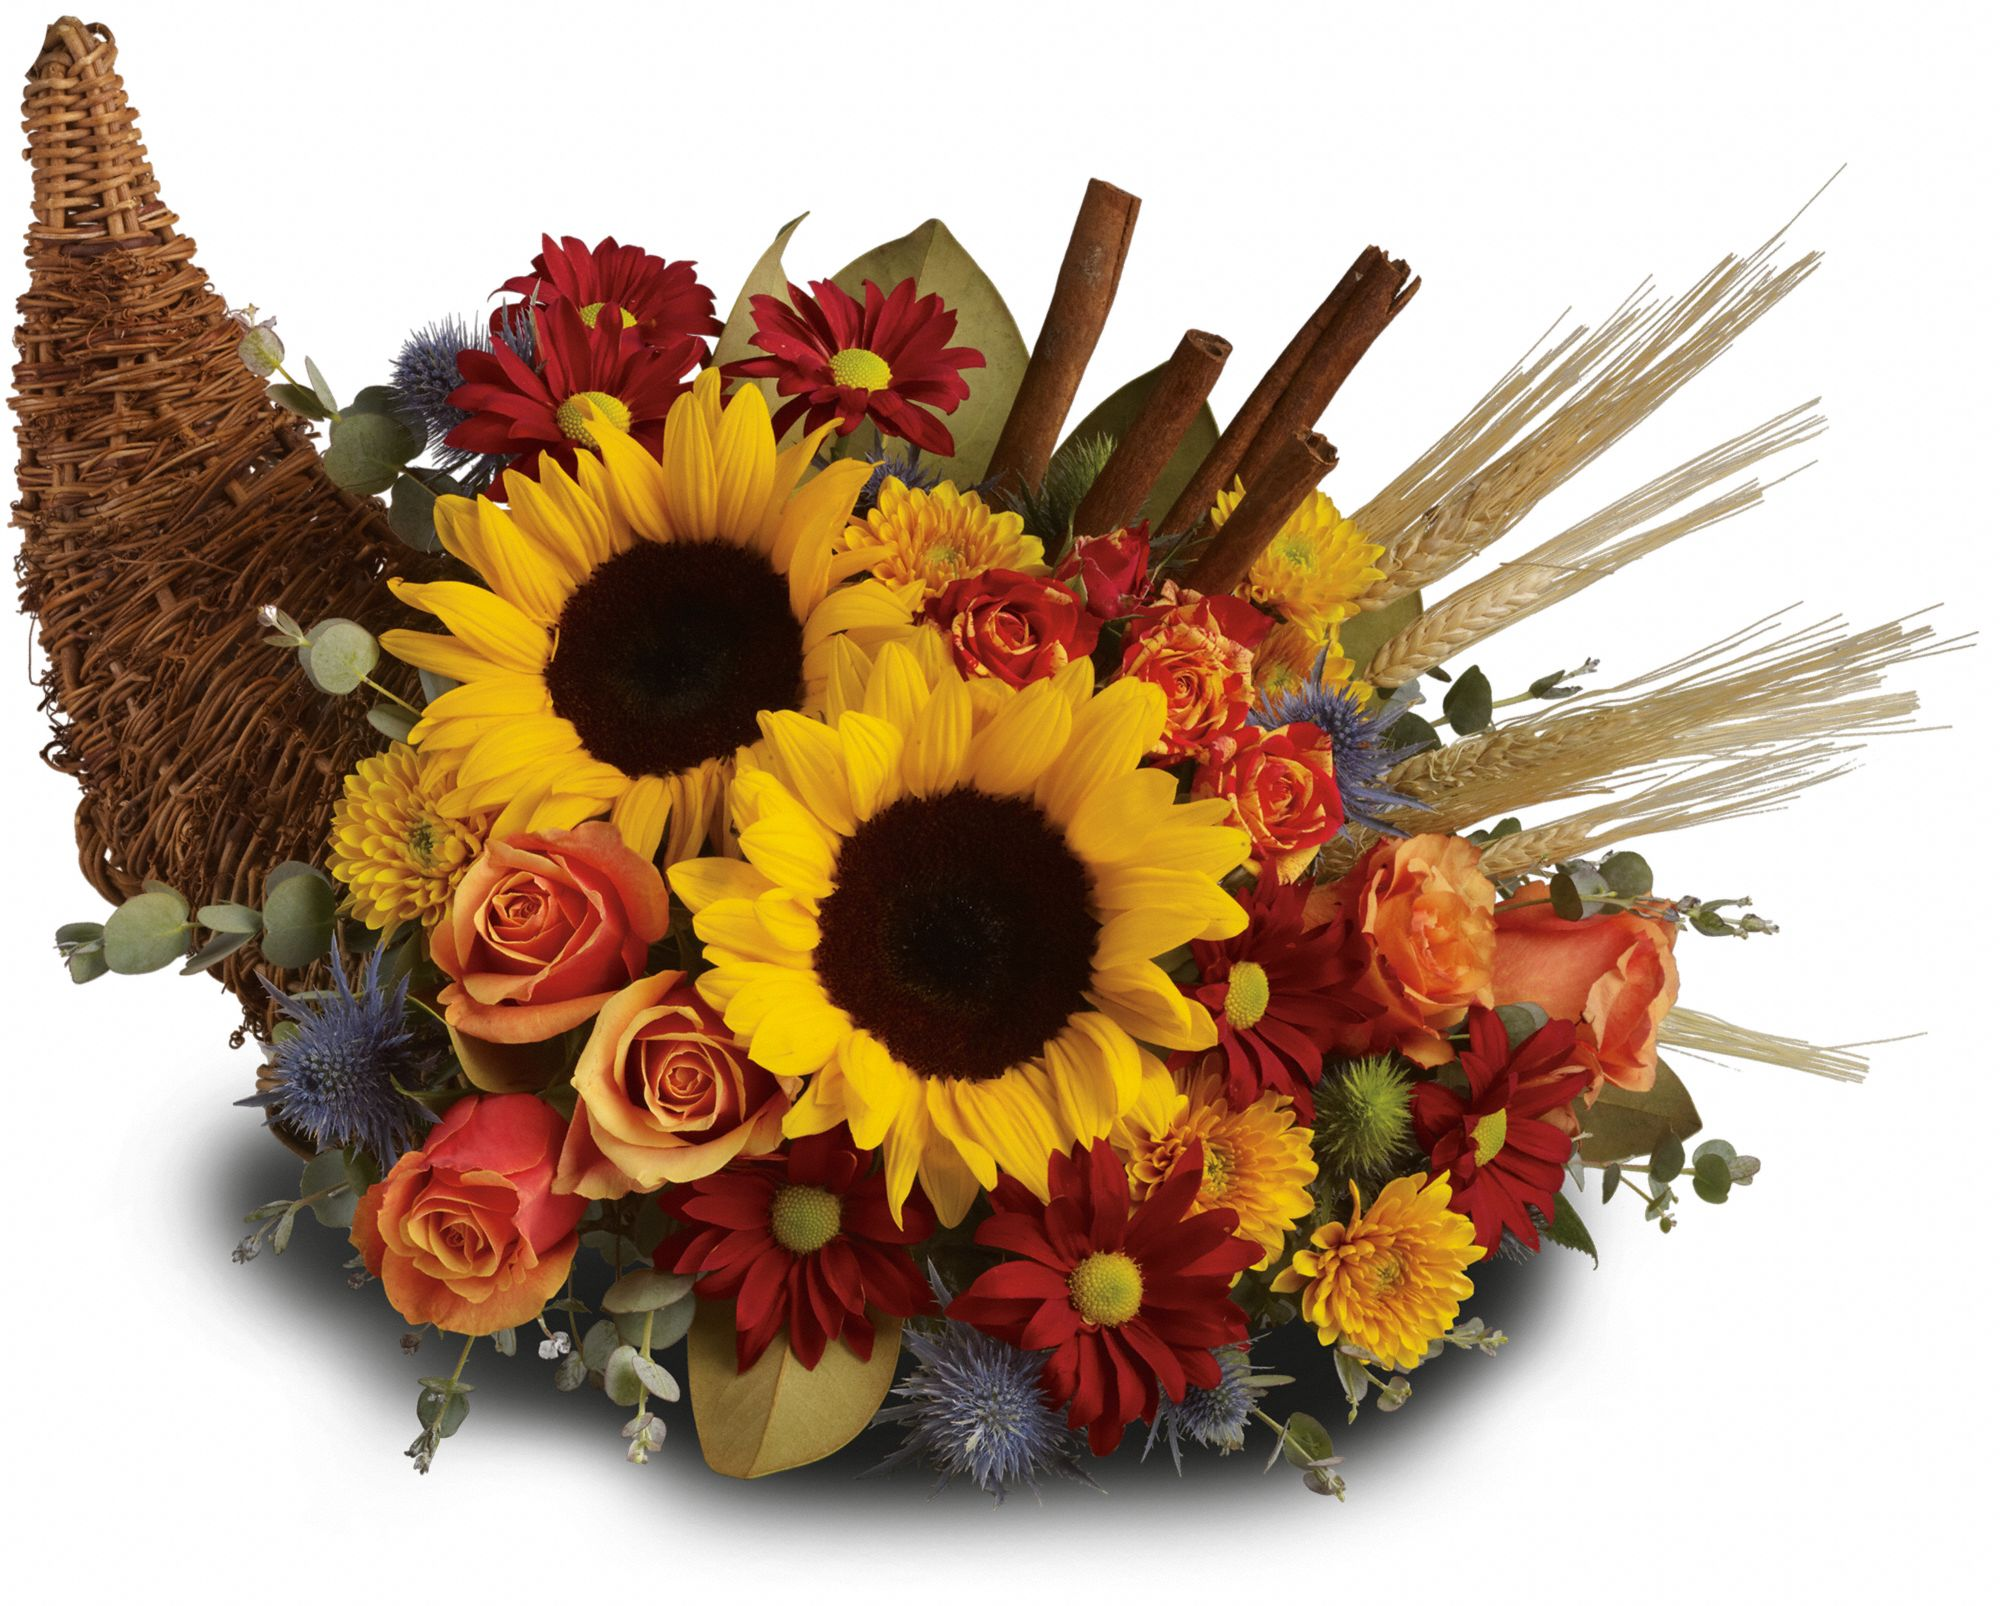 Cornucopia with fresh flowers